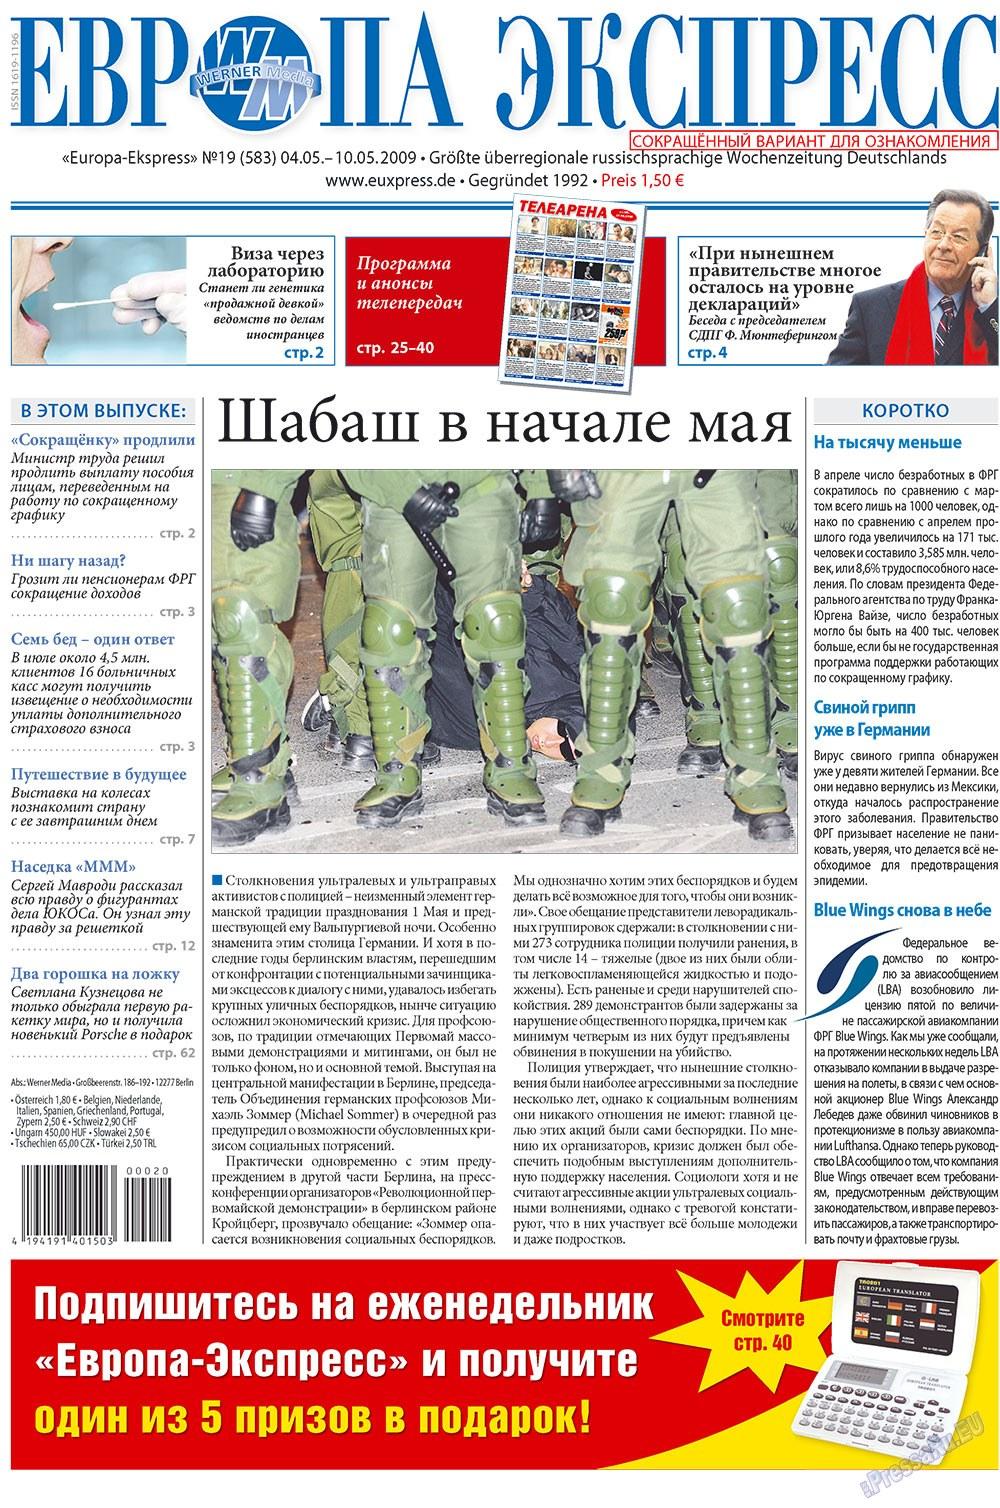 Европа экспресс (газета). 2009 год, номер 19, стр. 1